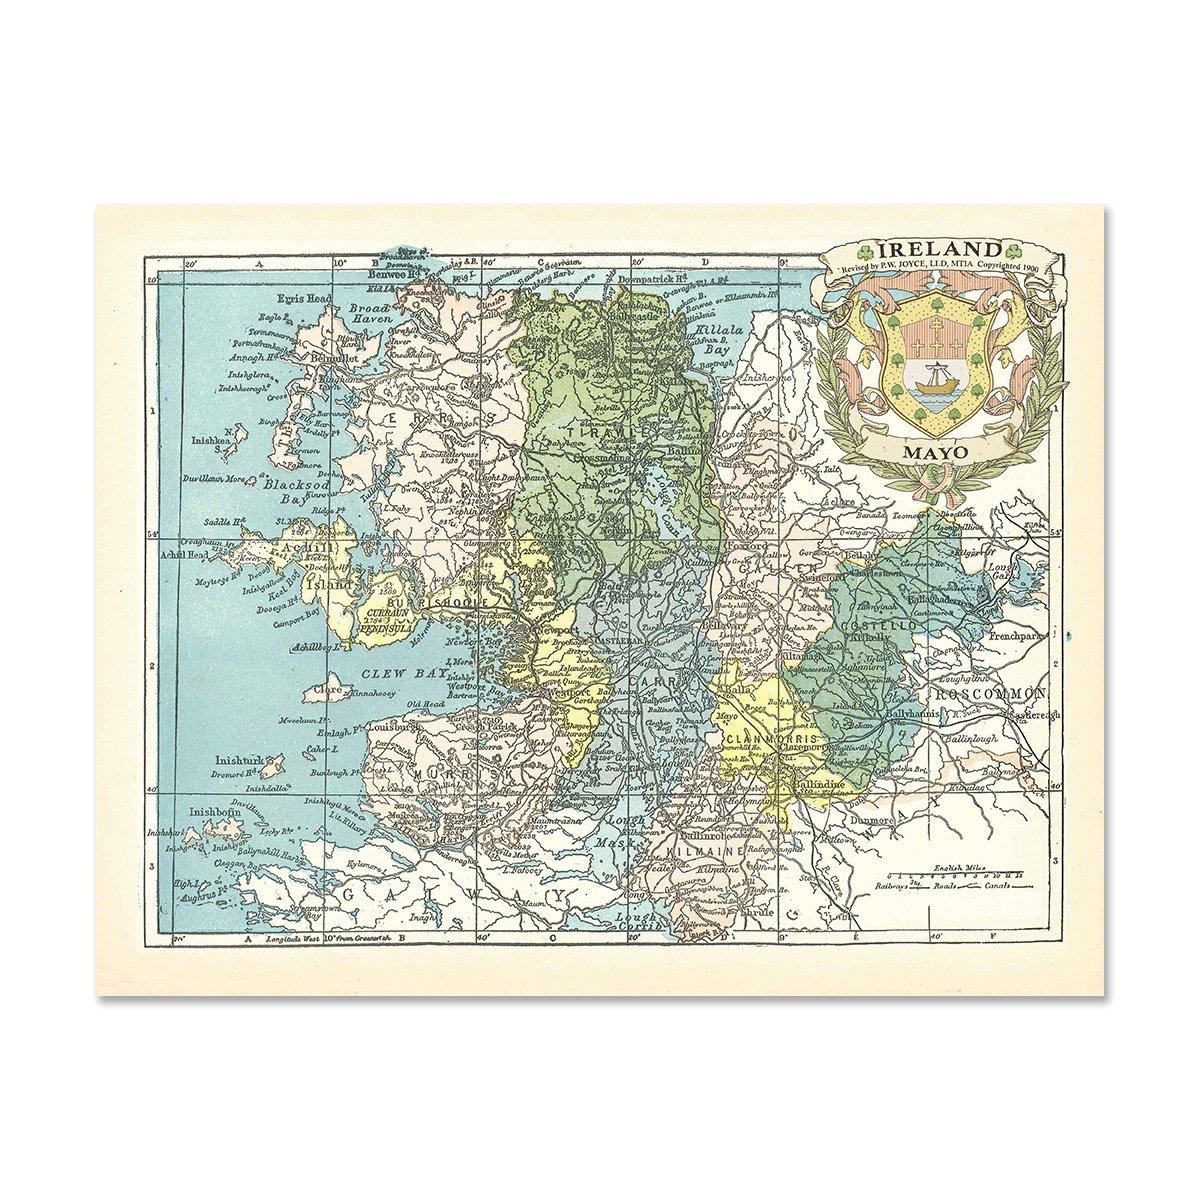 Print Map Of Ireland.Amazon Com Mayo County Map Of Ireland Antique Reproduction Print